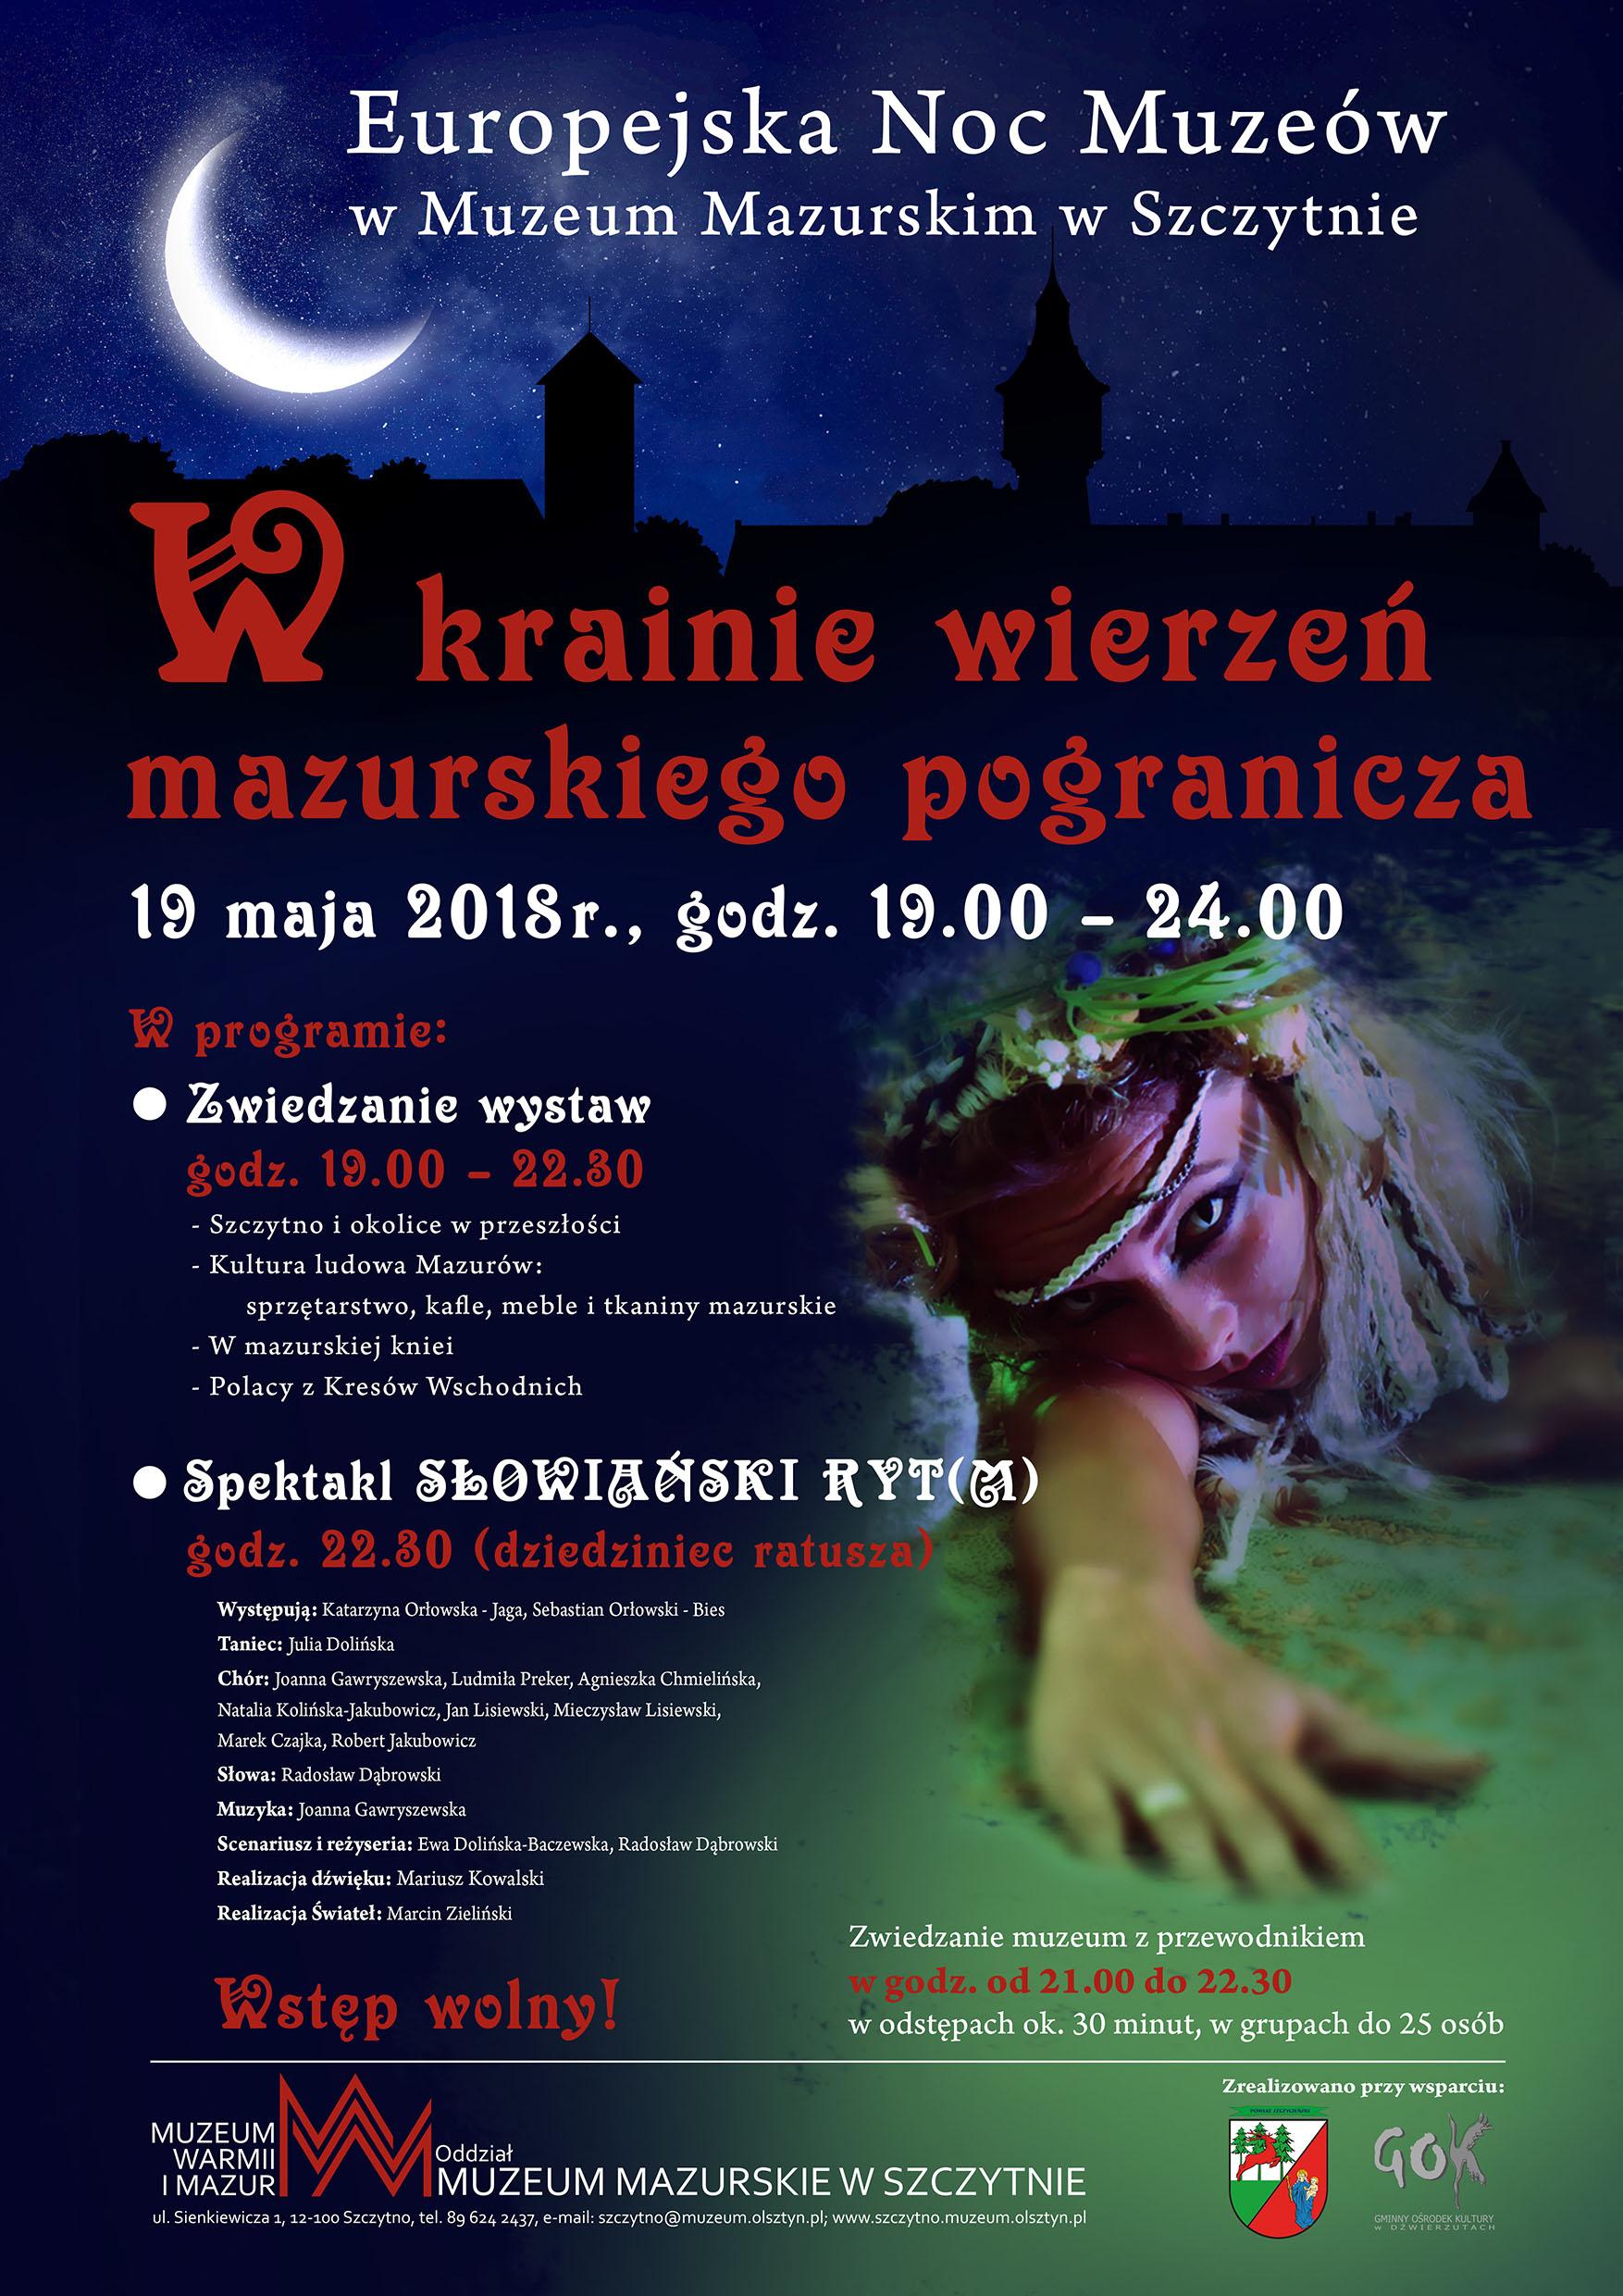 http://m.wmwm.pl/2018/04/orig/europejska-noc-muzeow-szczytno-2018-6081.jpg